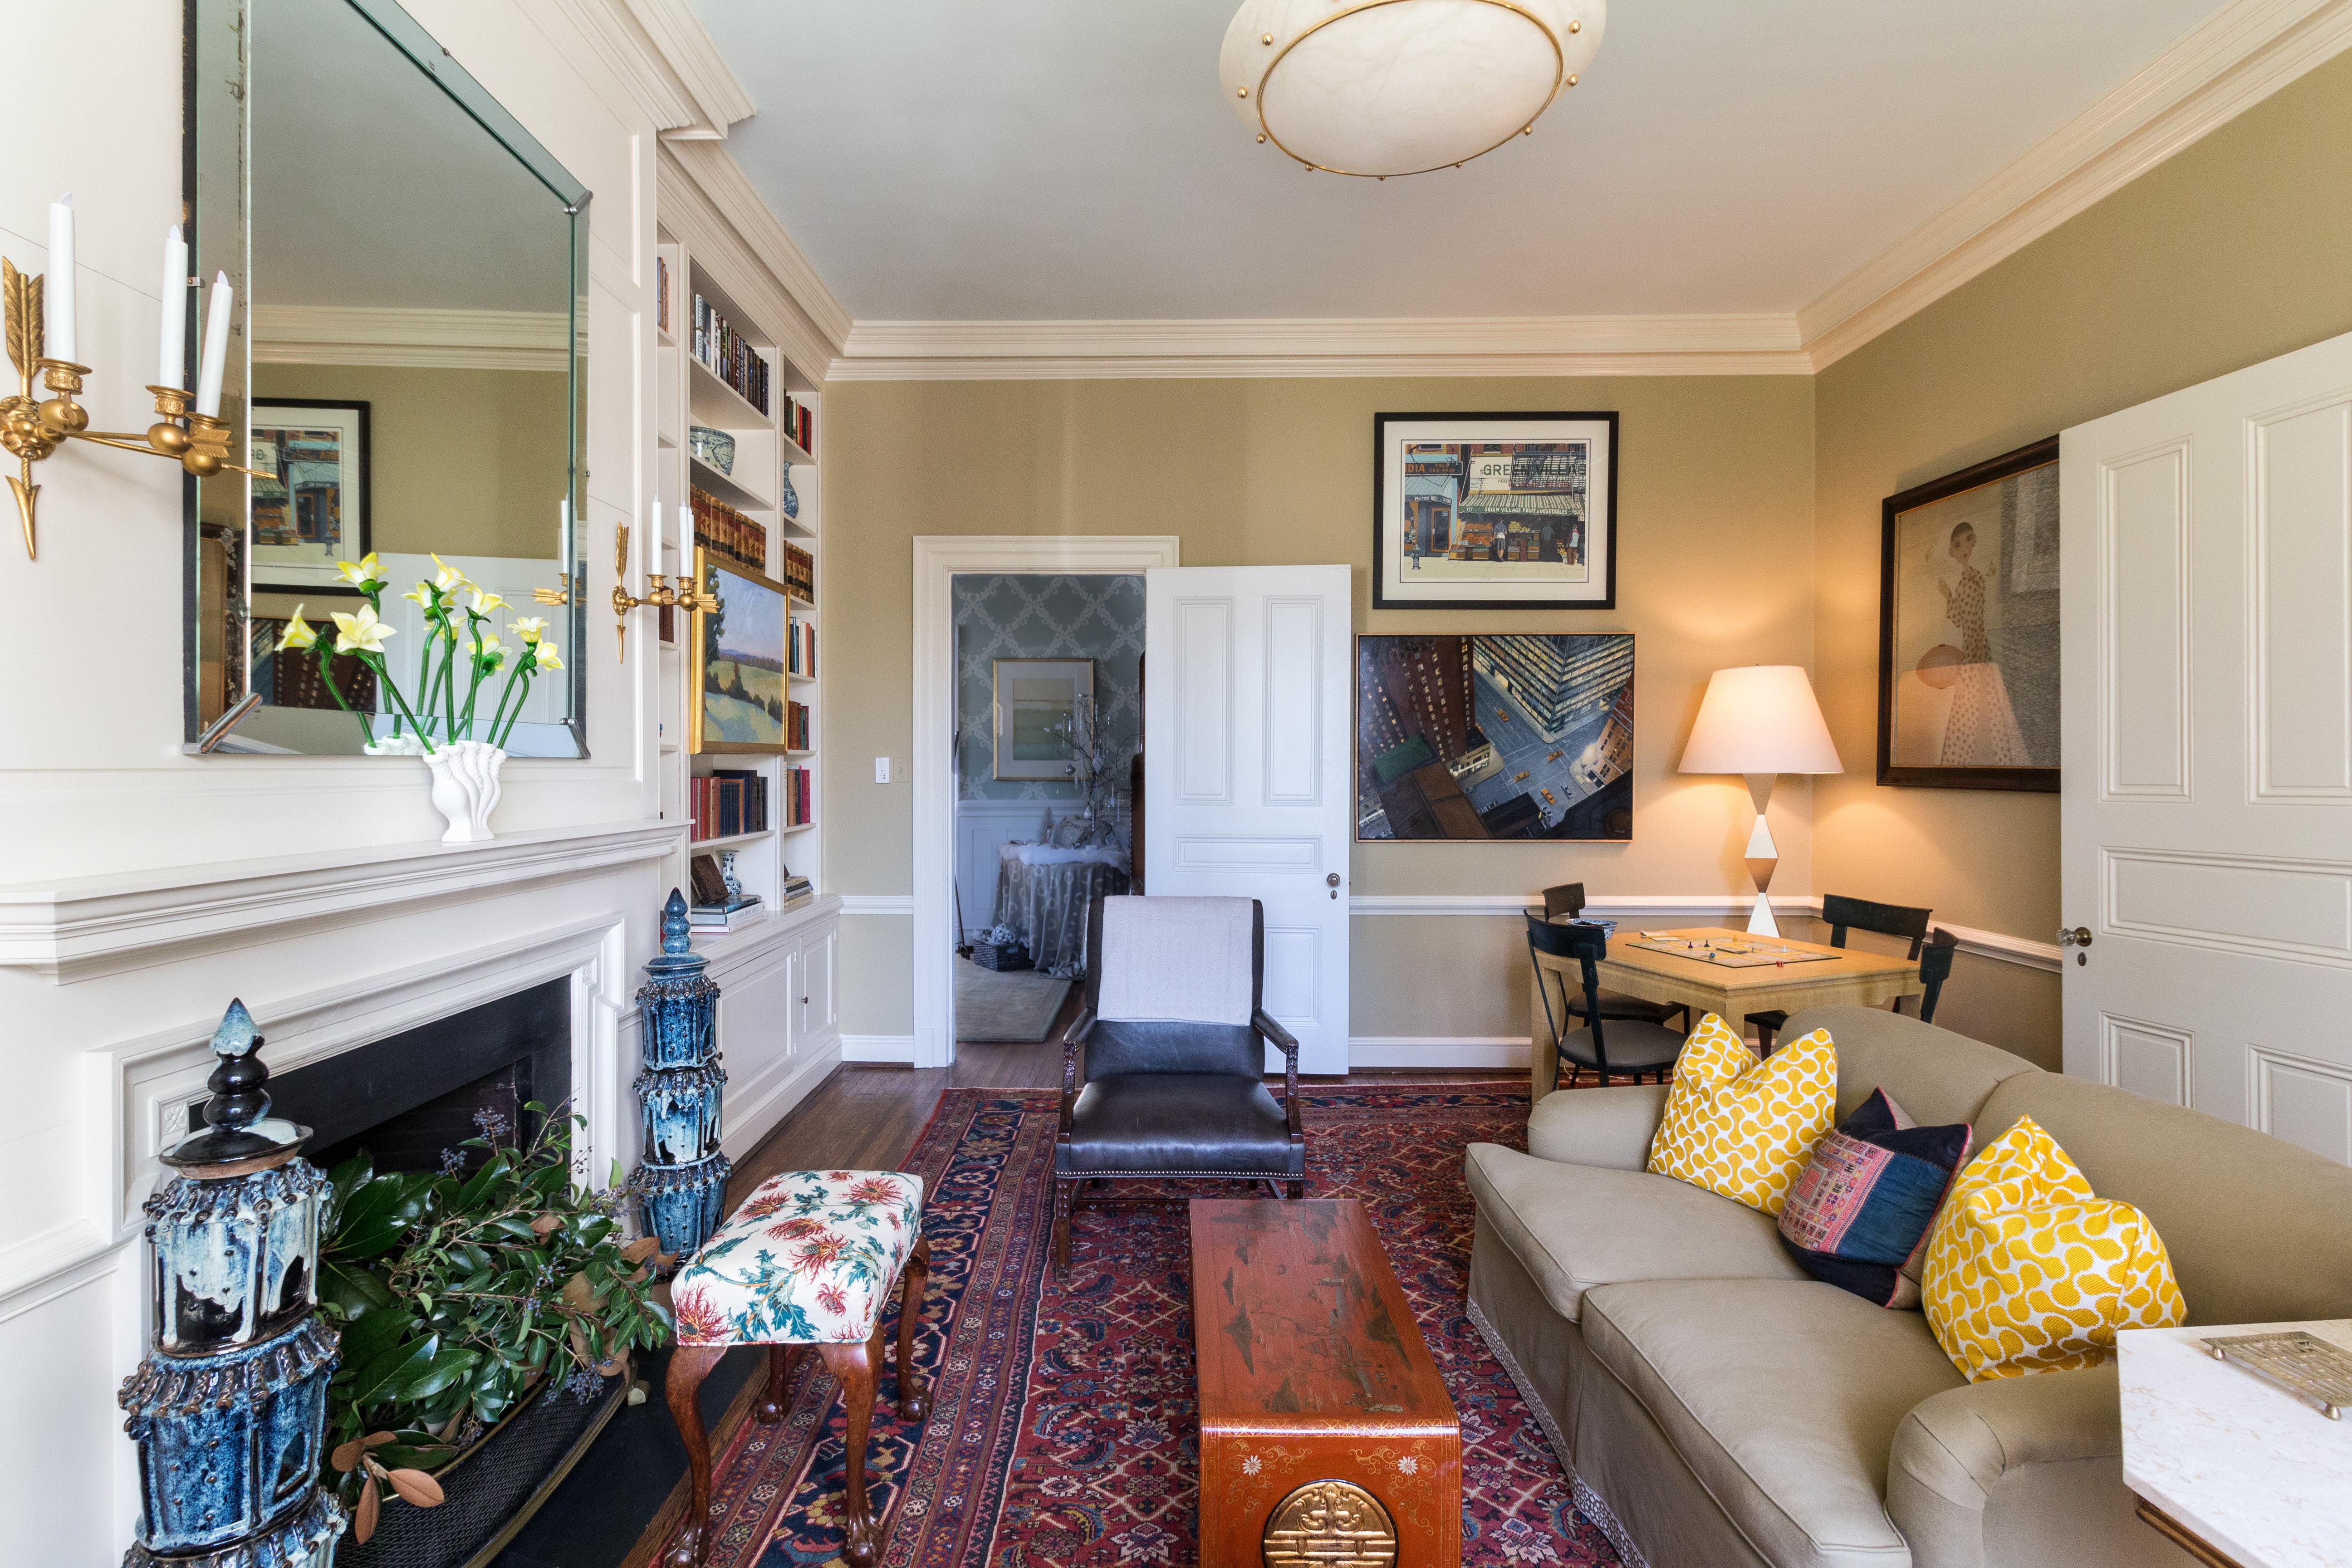 Beverly McCloskey - Design House Reshoot - No Watermark-2.jpg